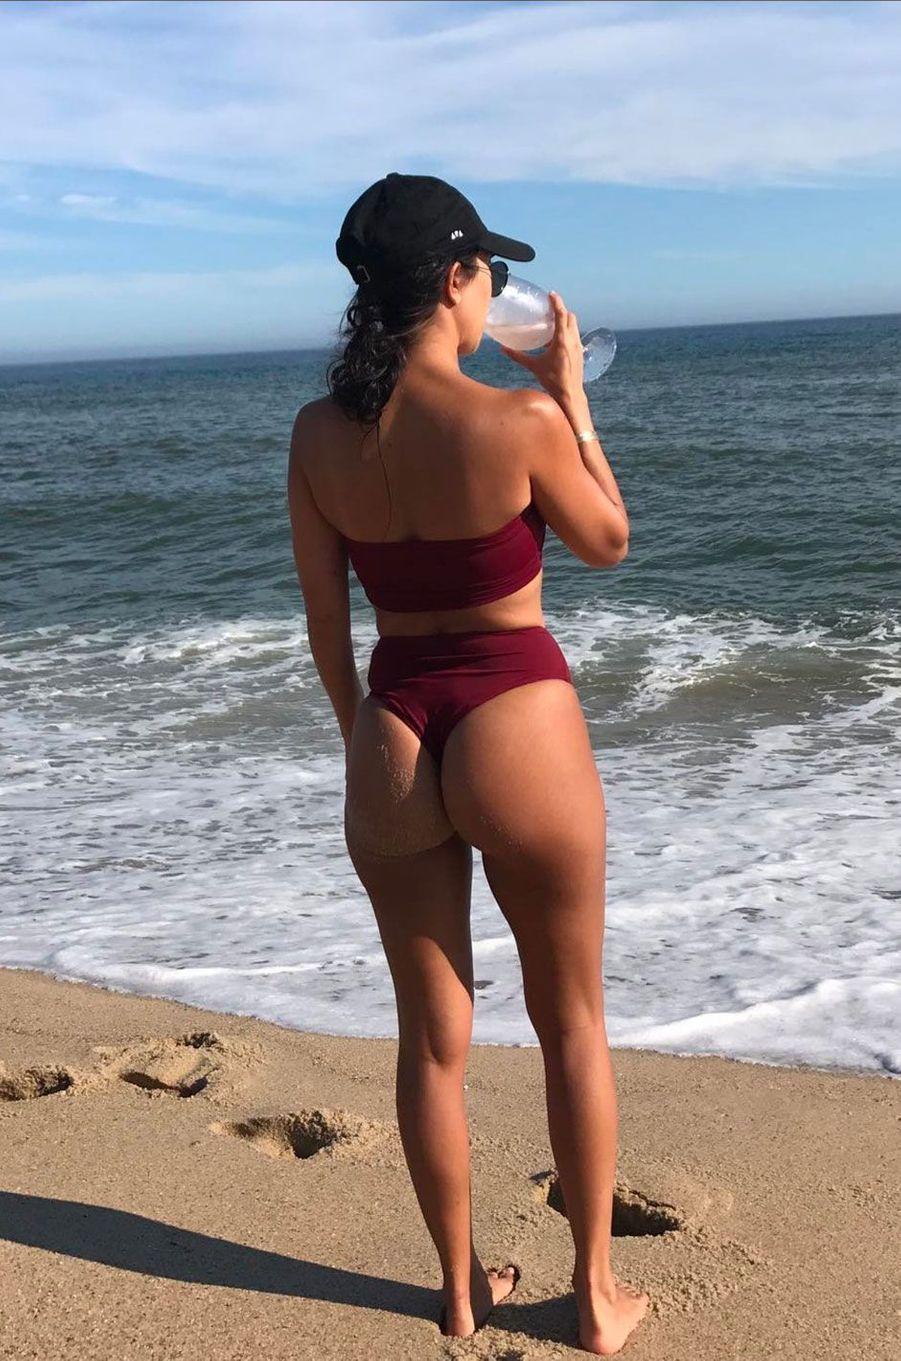 Sexy Match : Kourtney Kardashian, sensualité affirmée